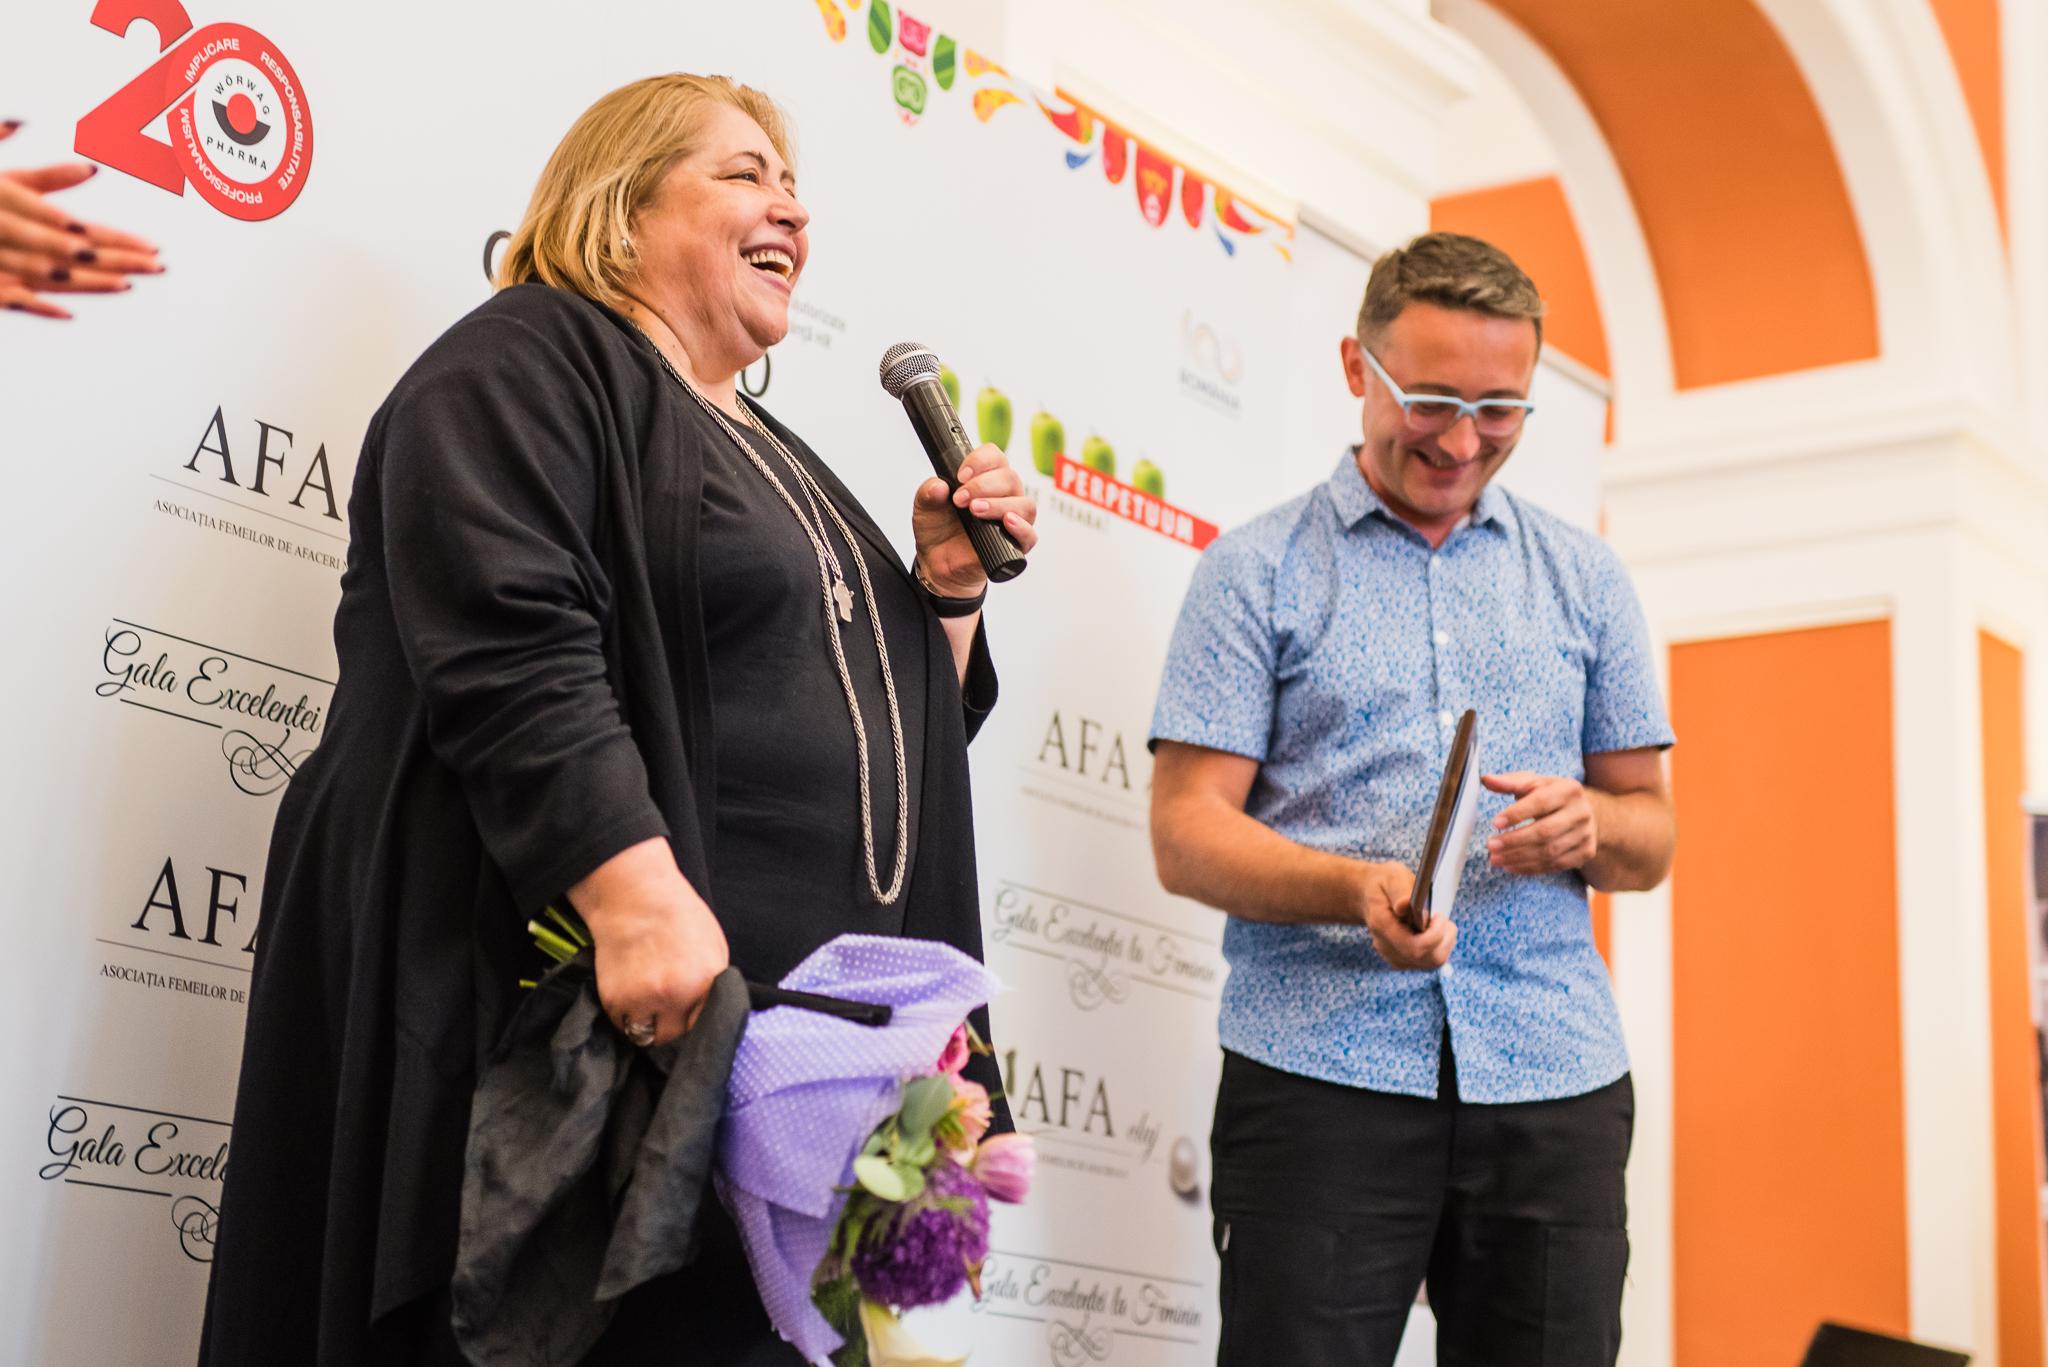 Gala-Excelentei-la-Feminin-2018-Elena-Basso-Stanescu-si-Tudor-Giurgiu